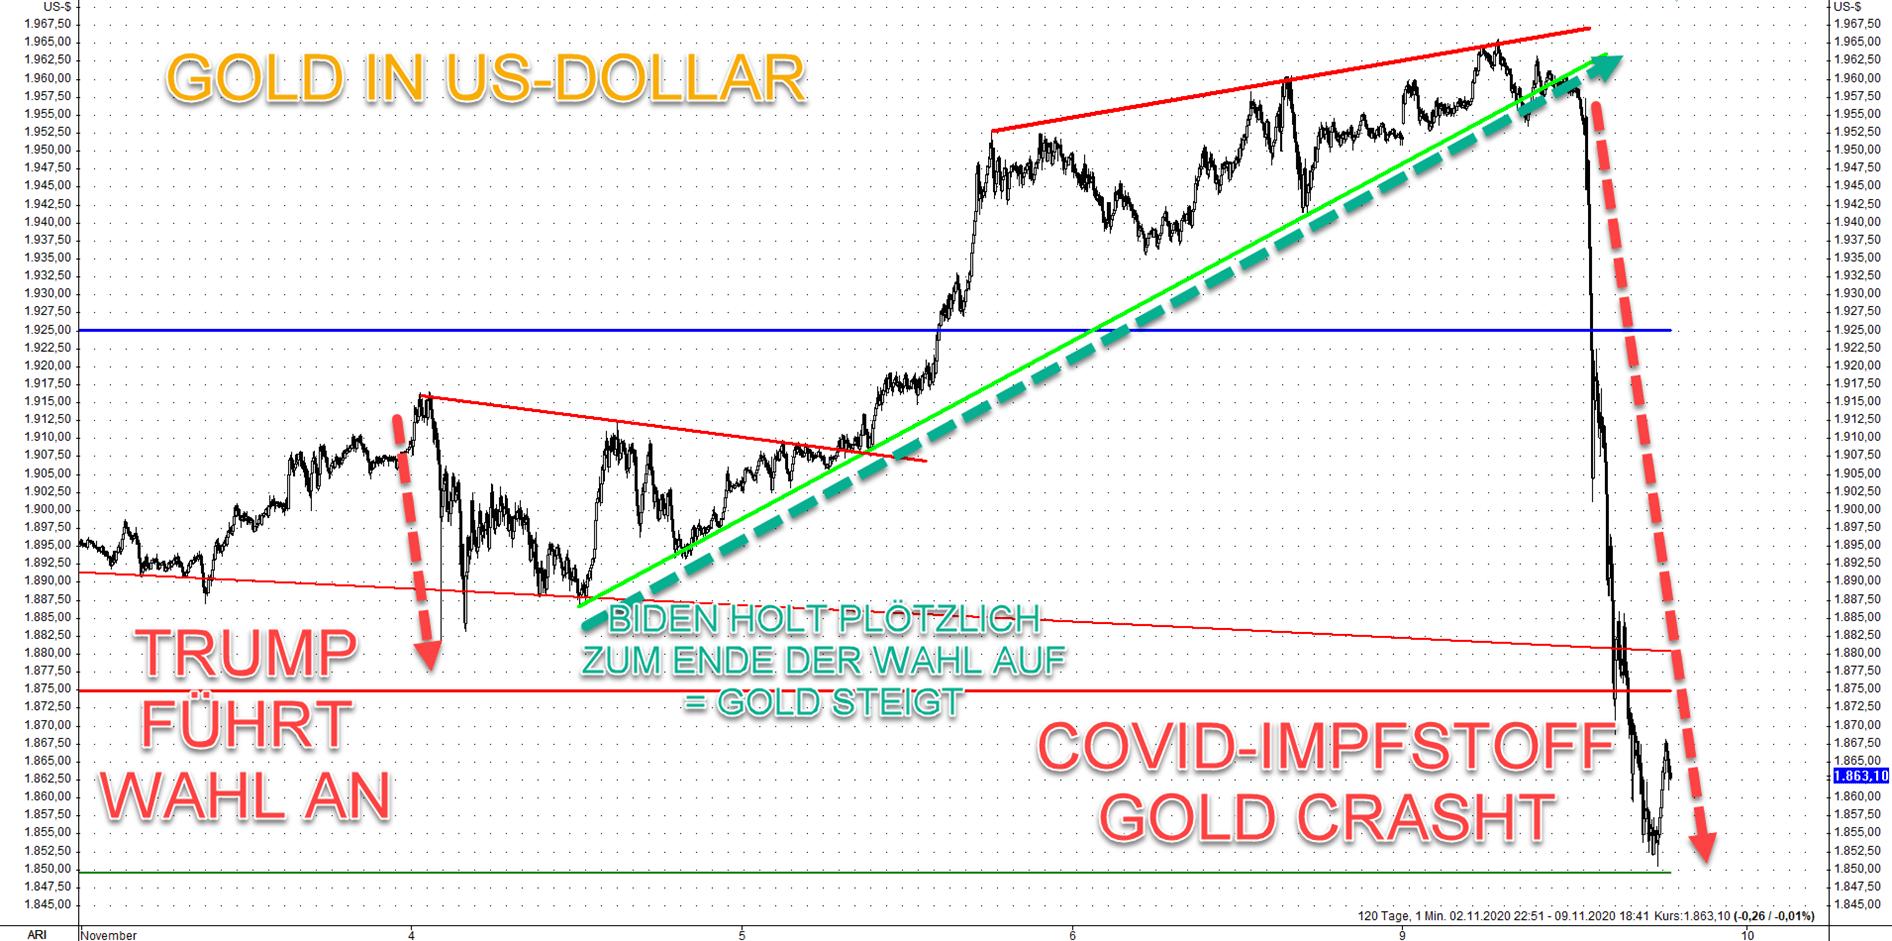 Gold in US-Dollar 16.11.2020